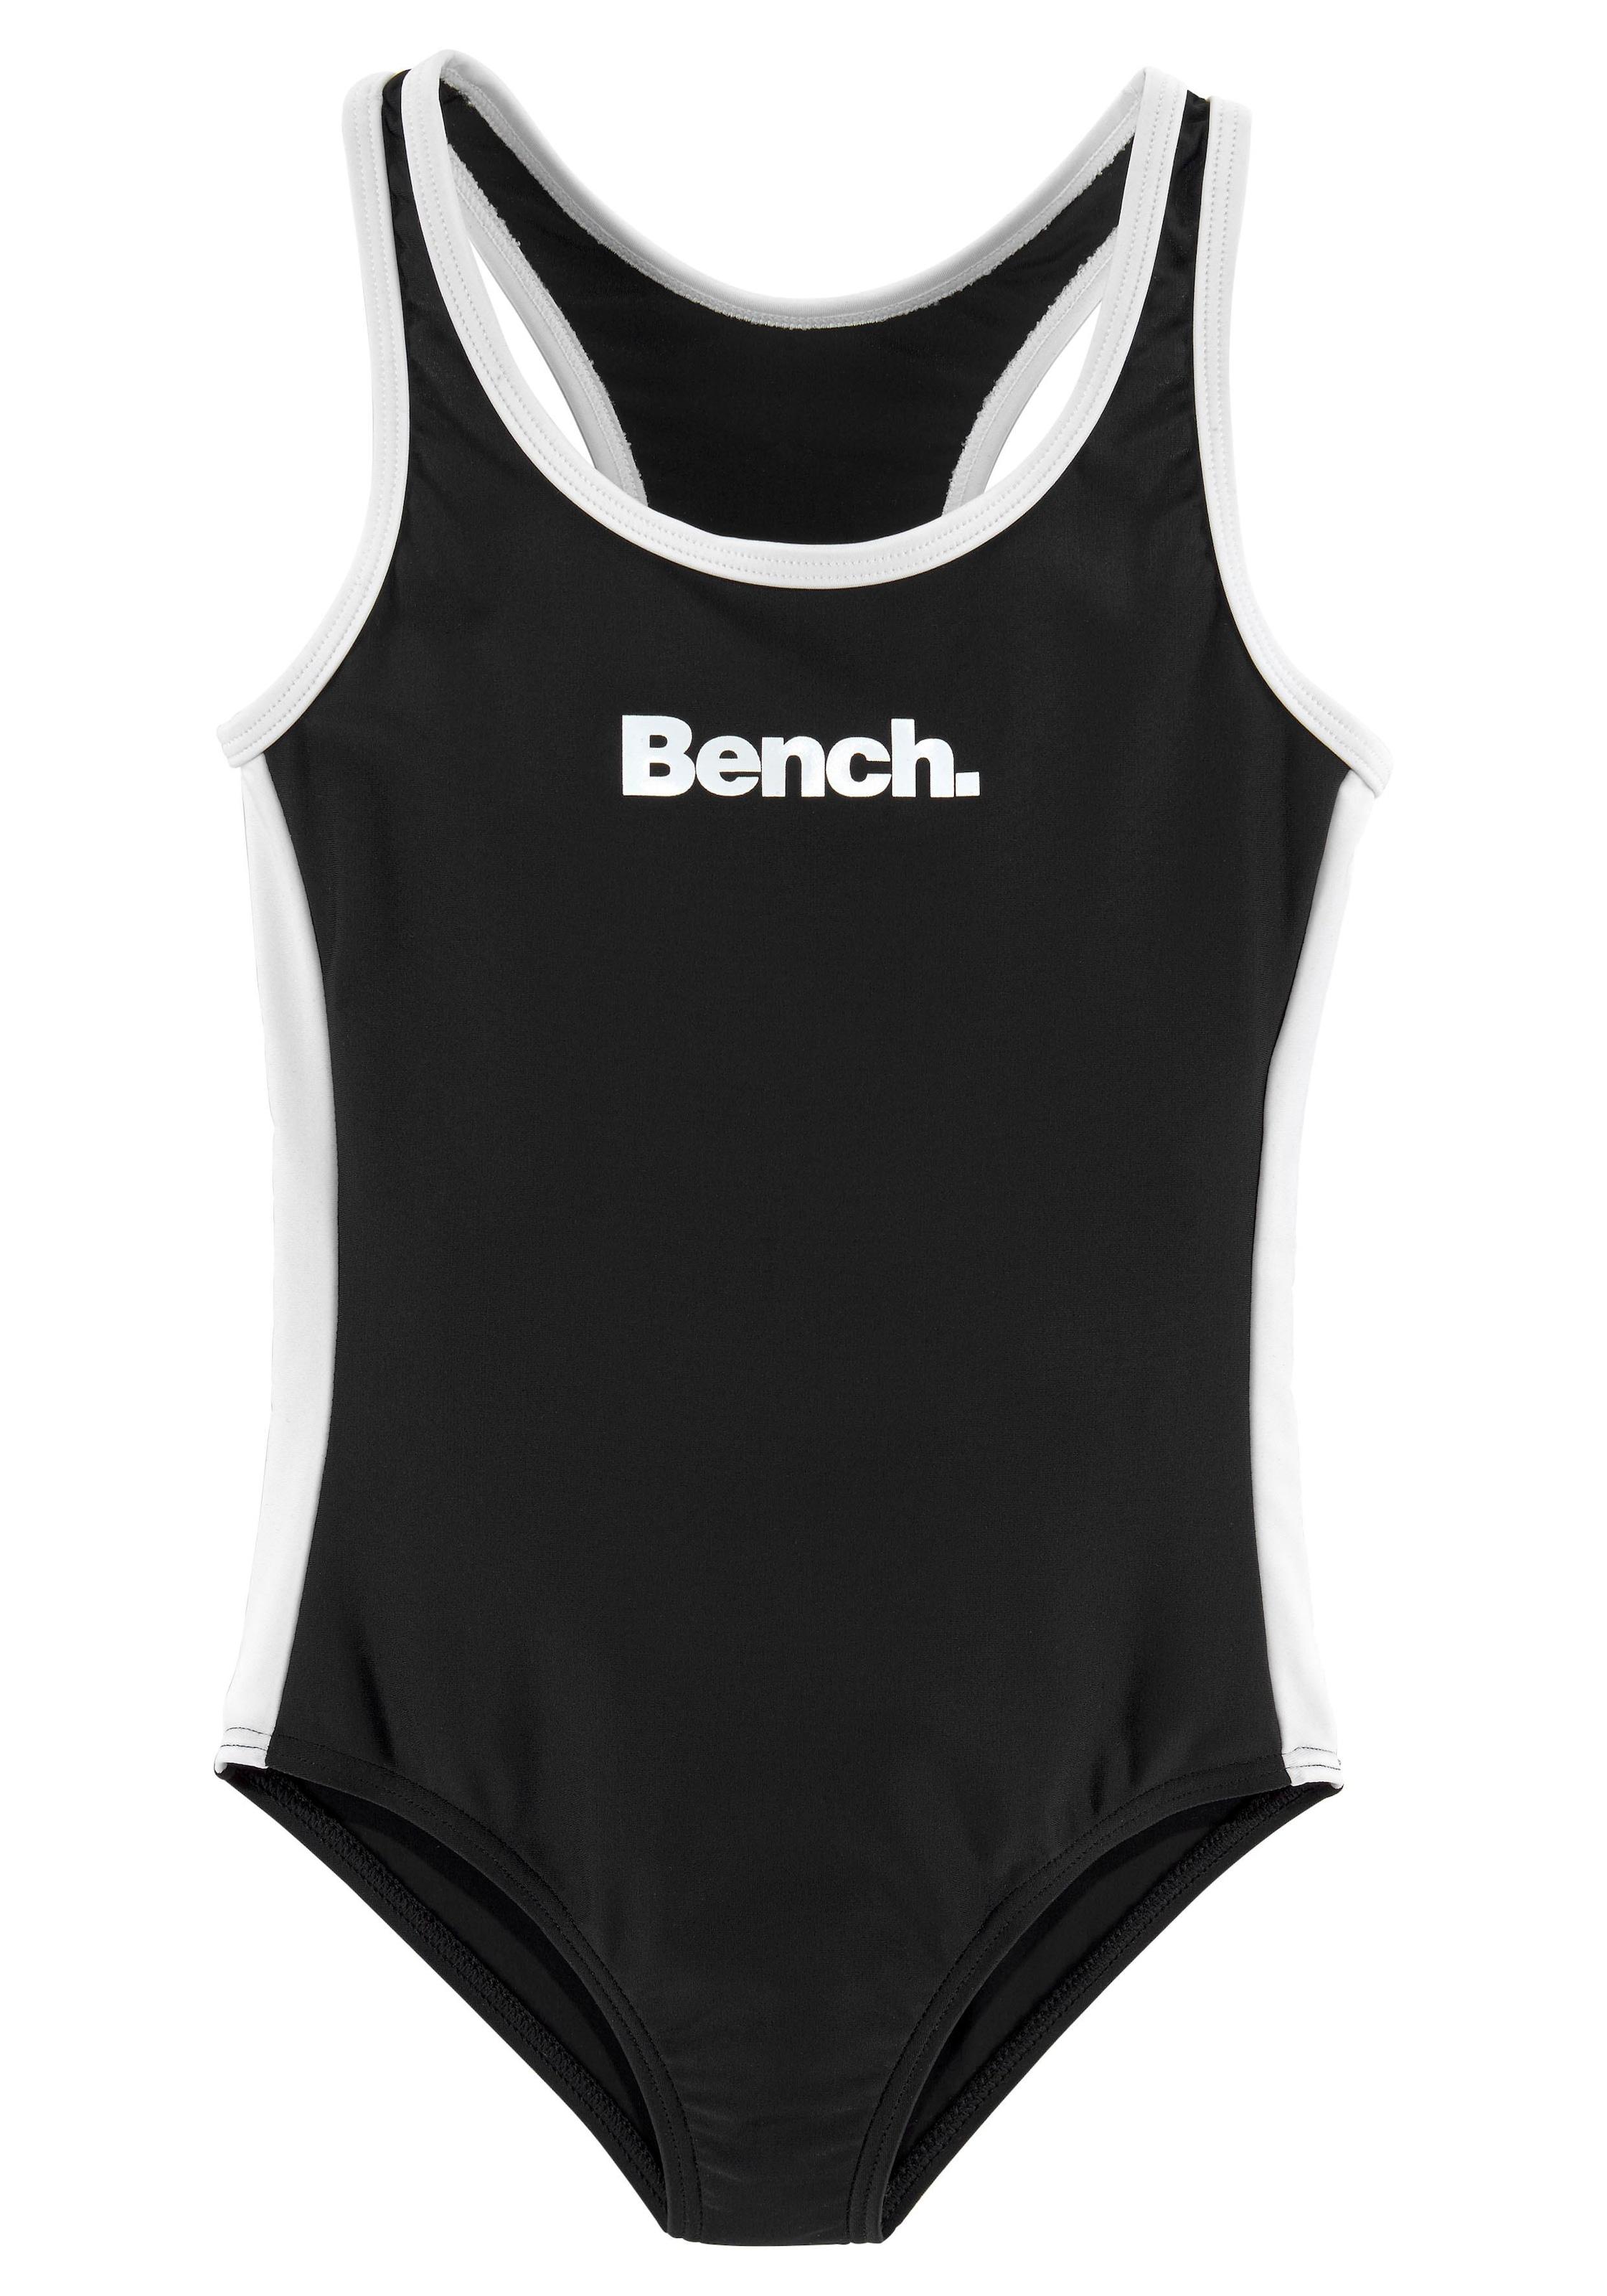 Image of Bench. Badeanzug, mit Logoprint